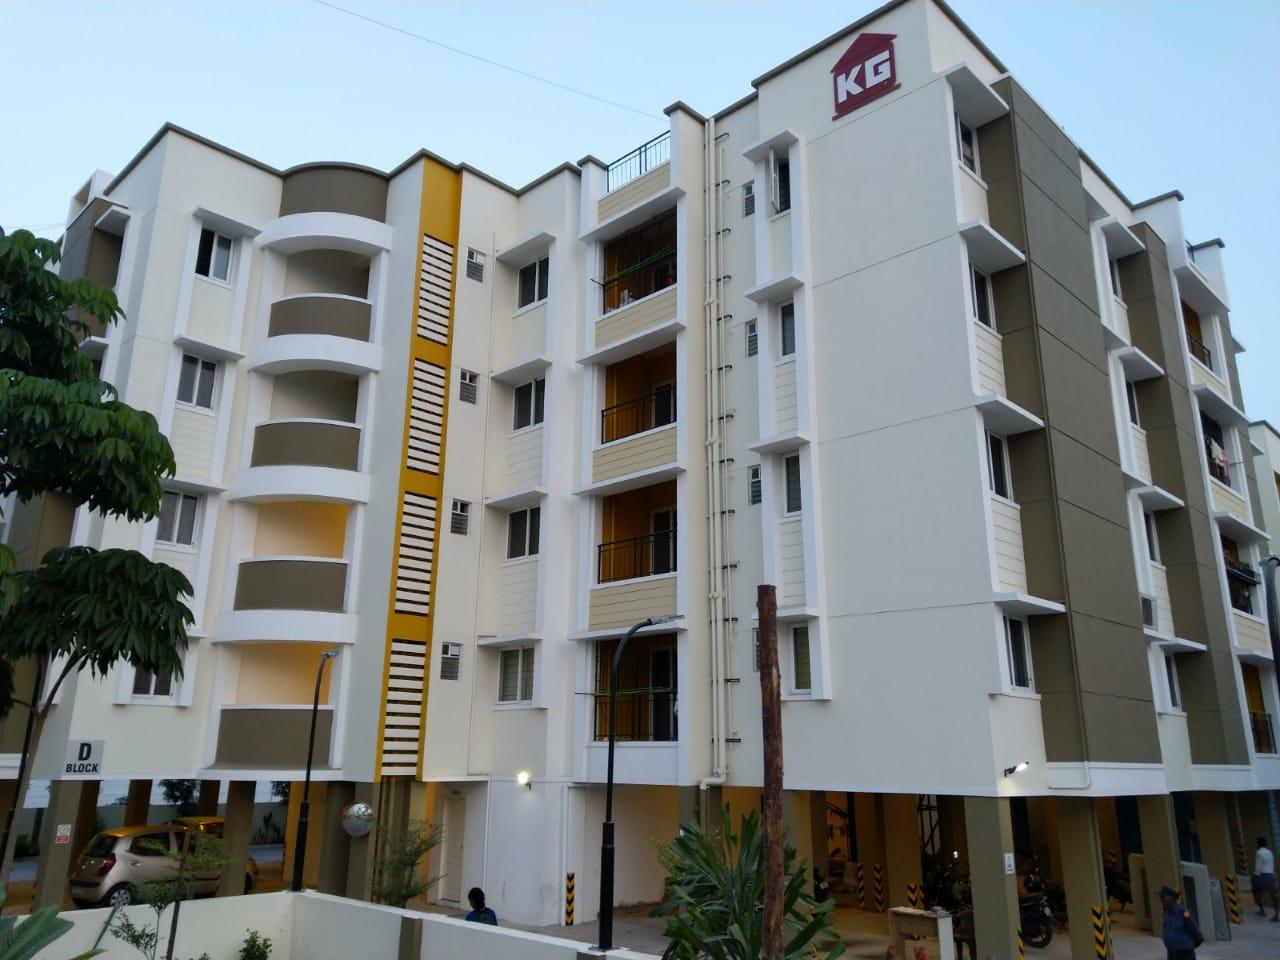 2 bhk apartments for sale in perumbakkam - KG Builders